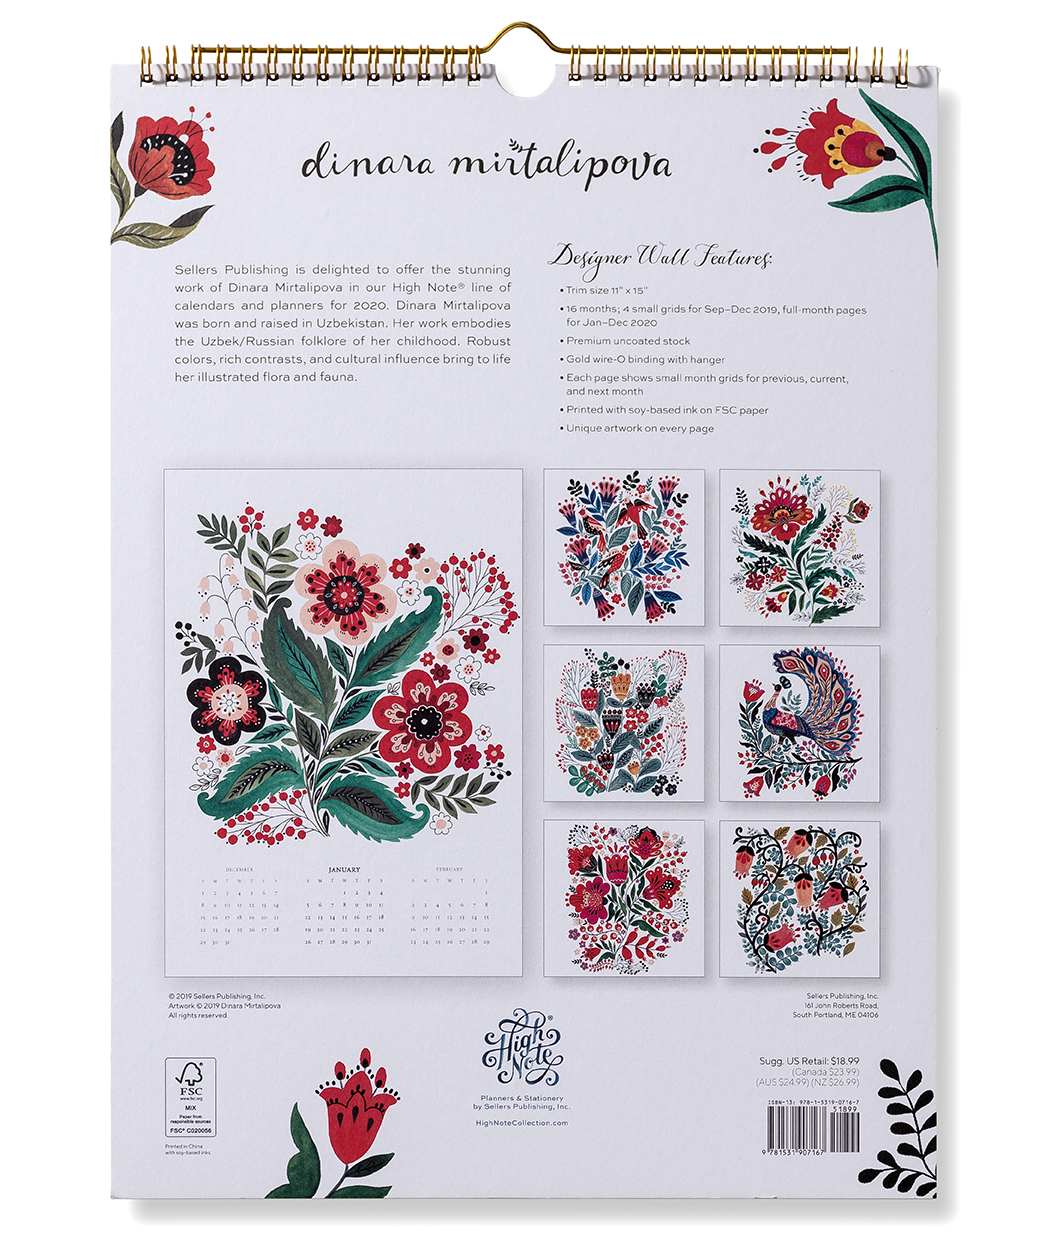 High Note 2020 Floral Typography by Jill De Haan Designer Wall Calendar